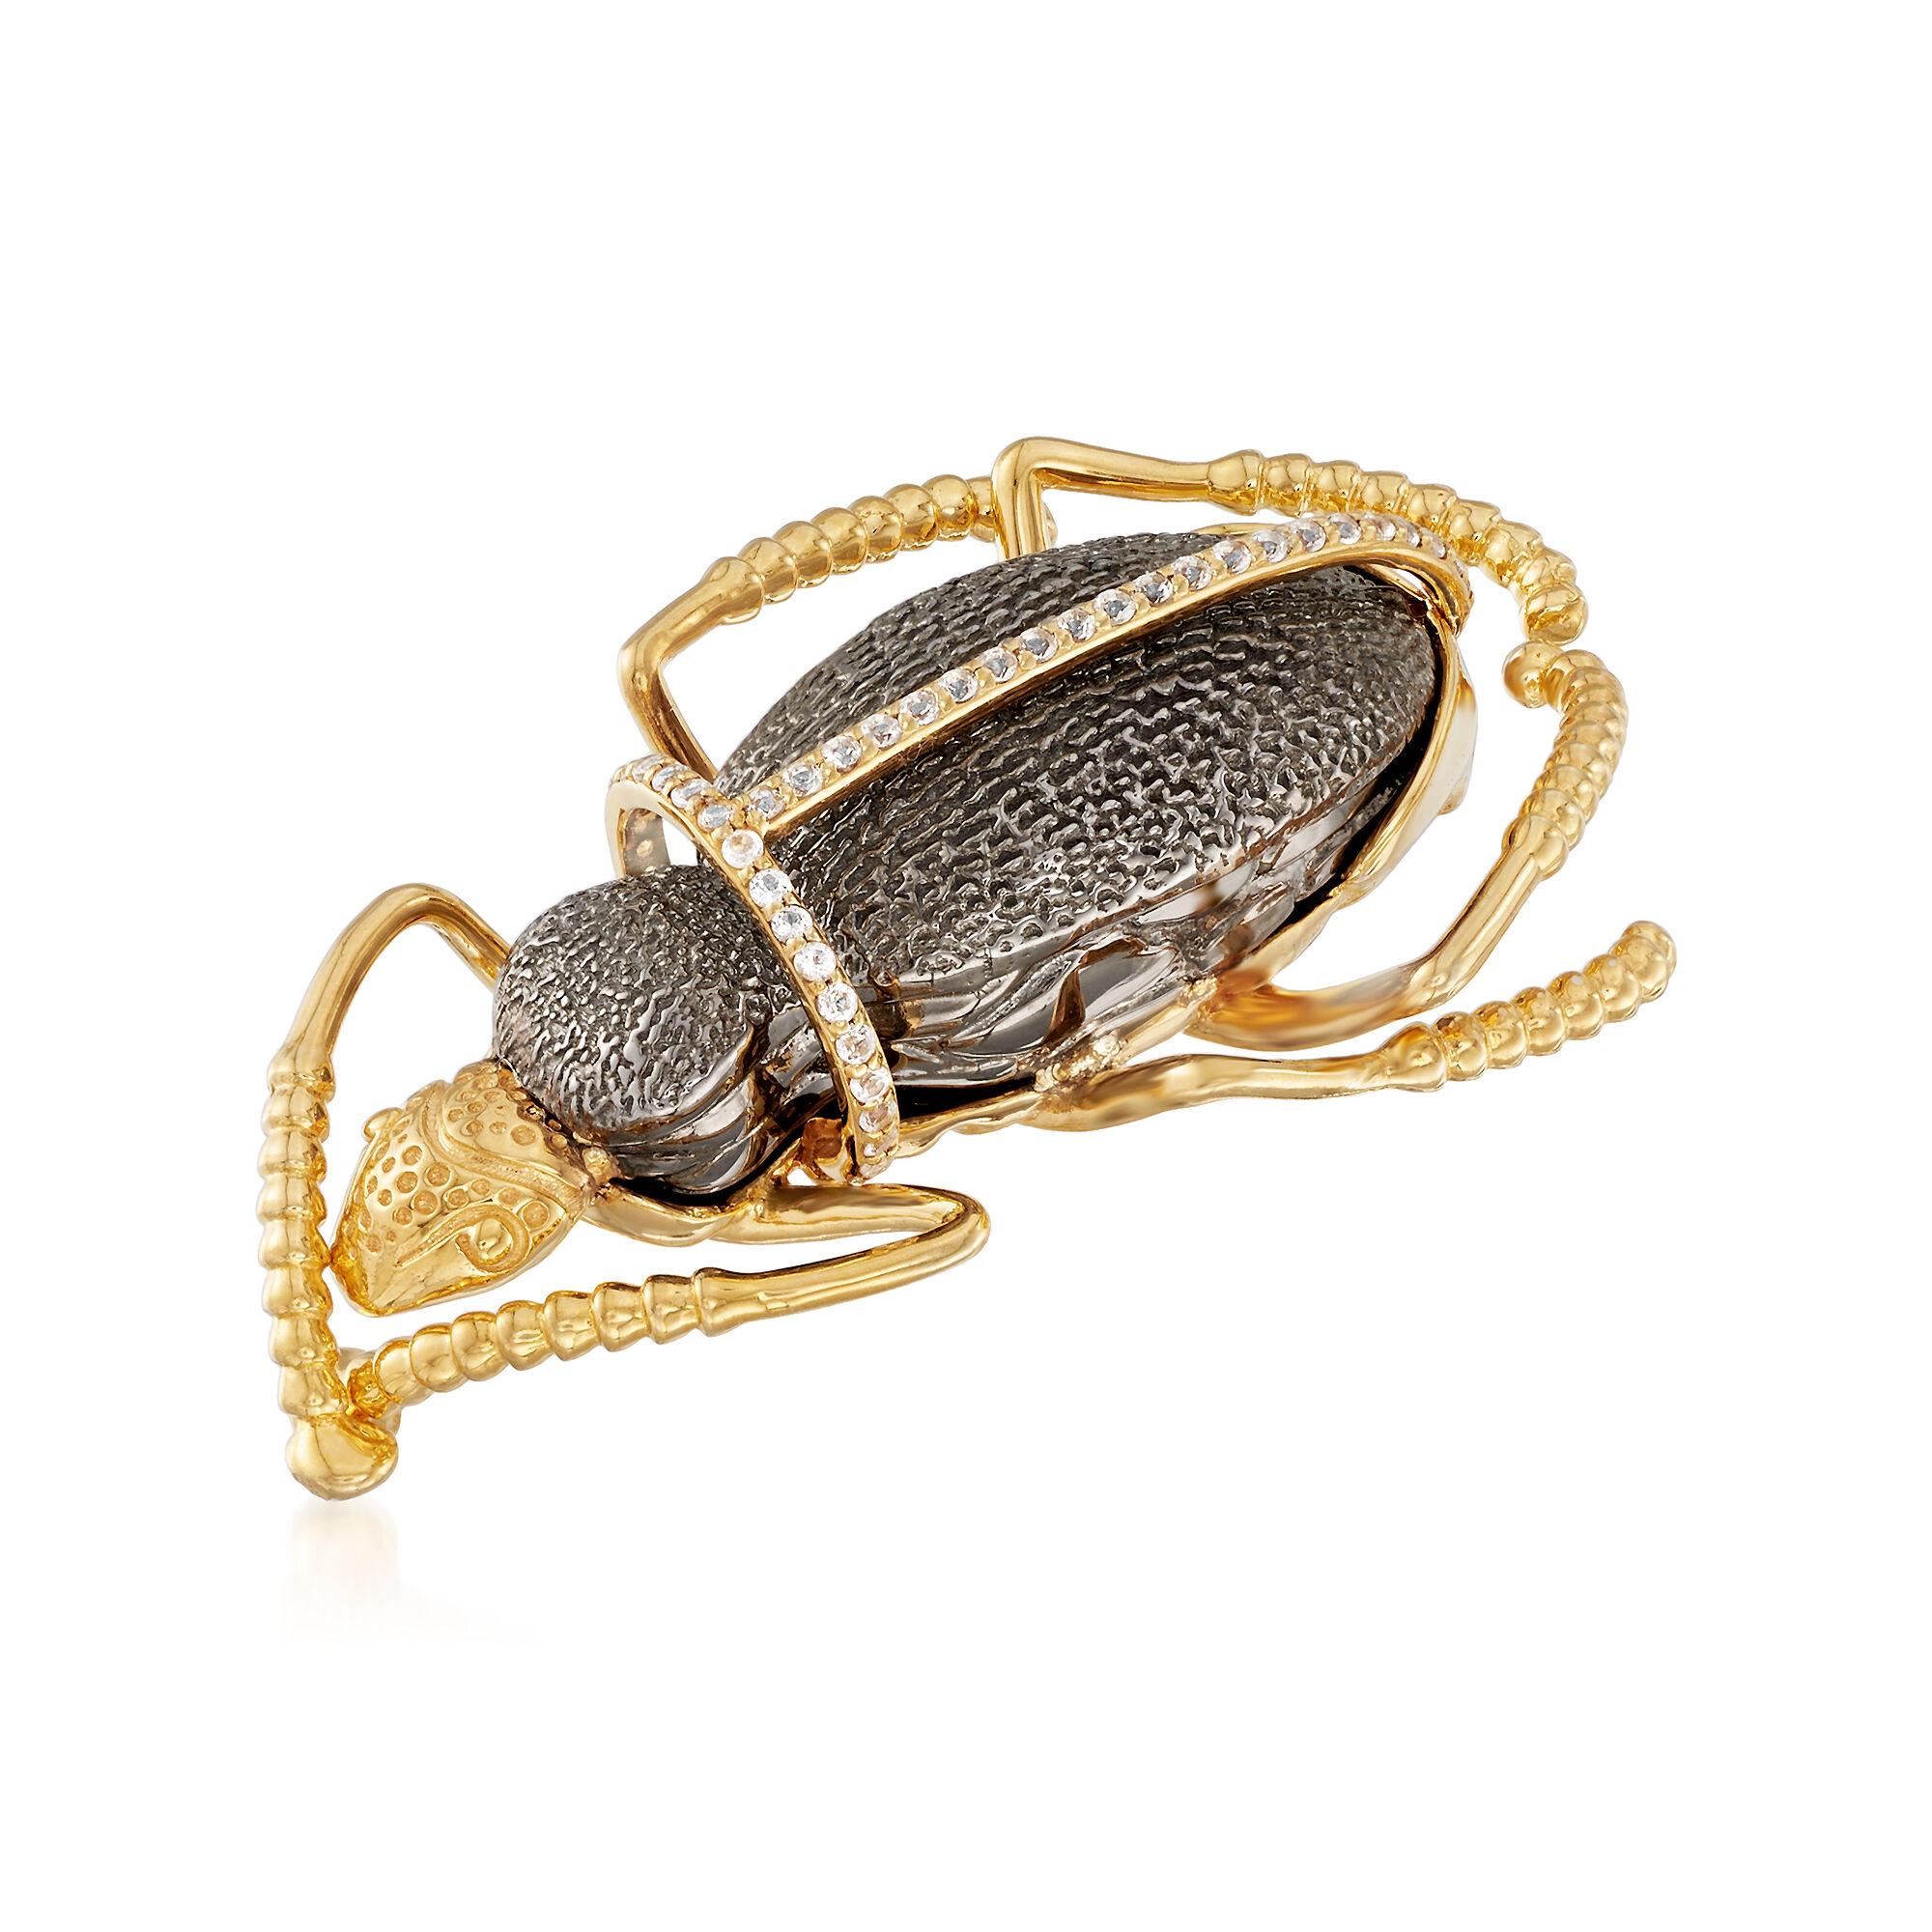 t.w Ross-Simons 0.40 ct White Topaz Bug Pin in 18kt Gold Over Sterling